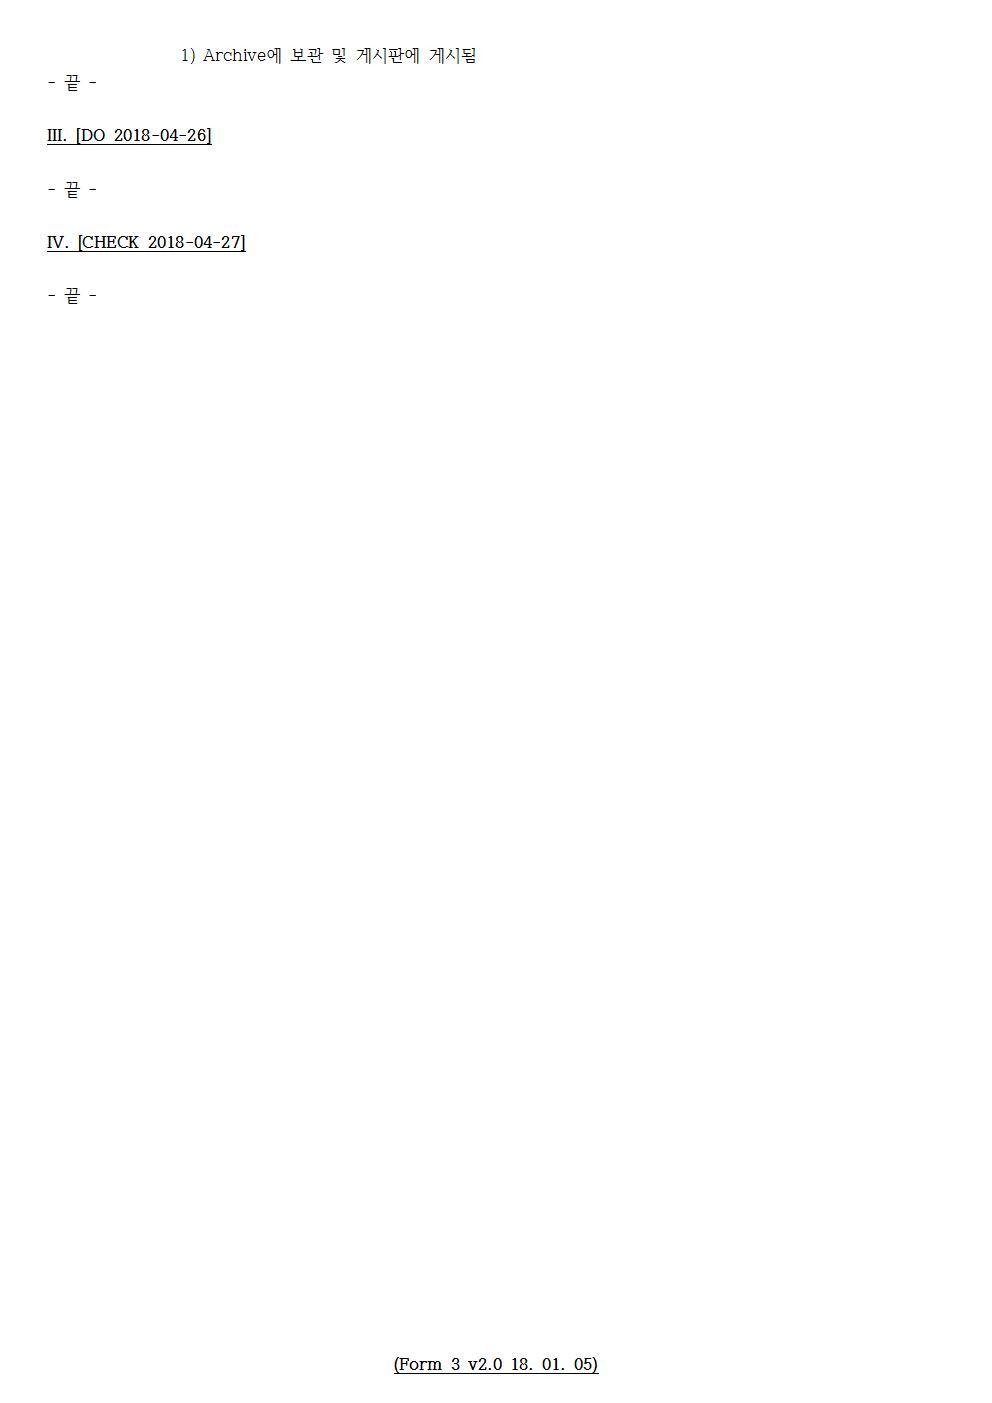 D-[18-001-RD-01]-[SAVE 3.0]-[2018-04-30][SH]002.jpg